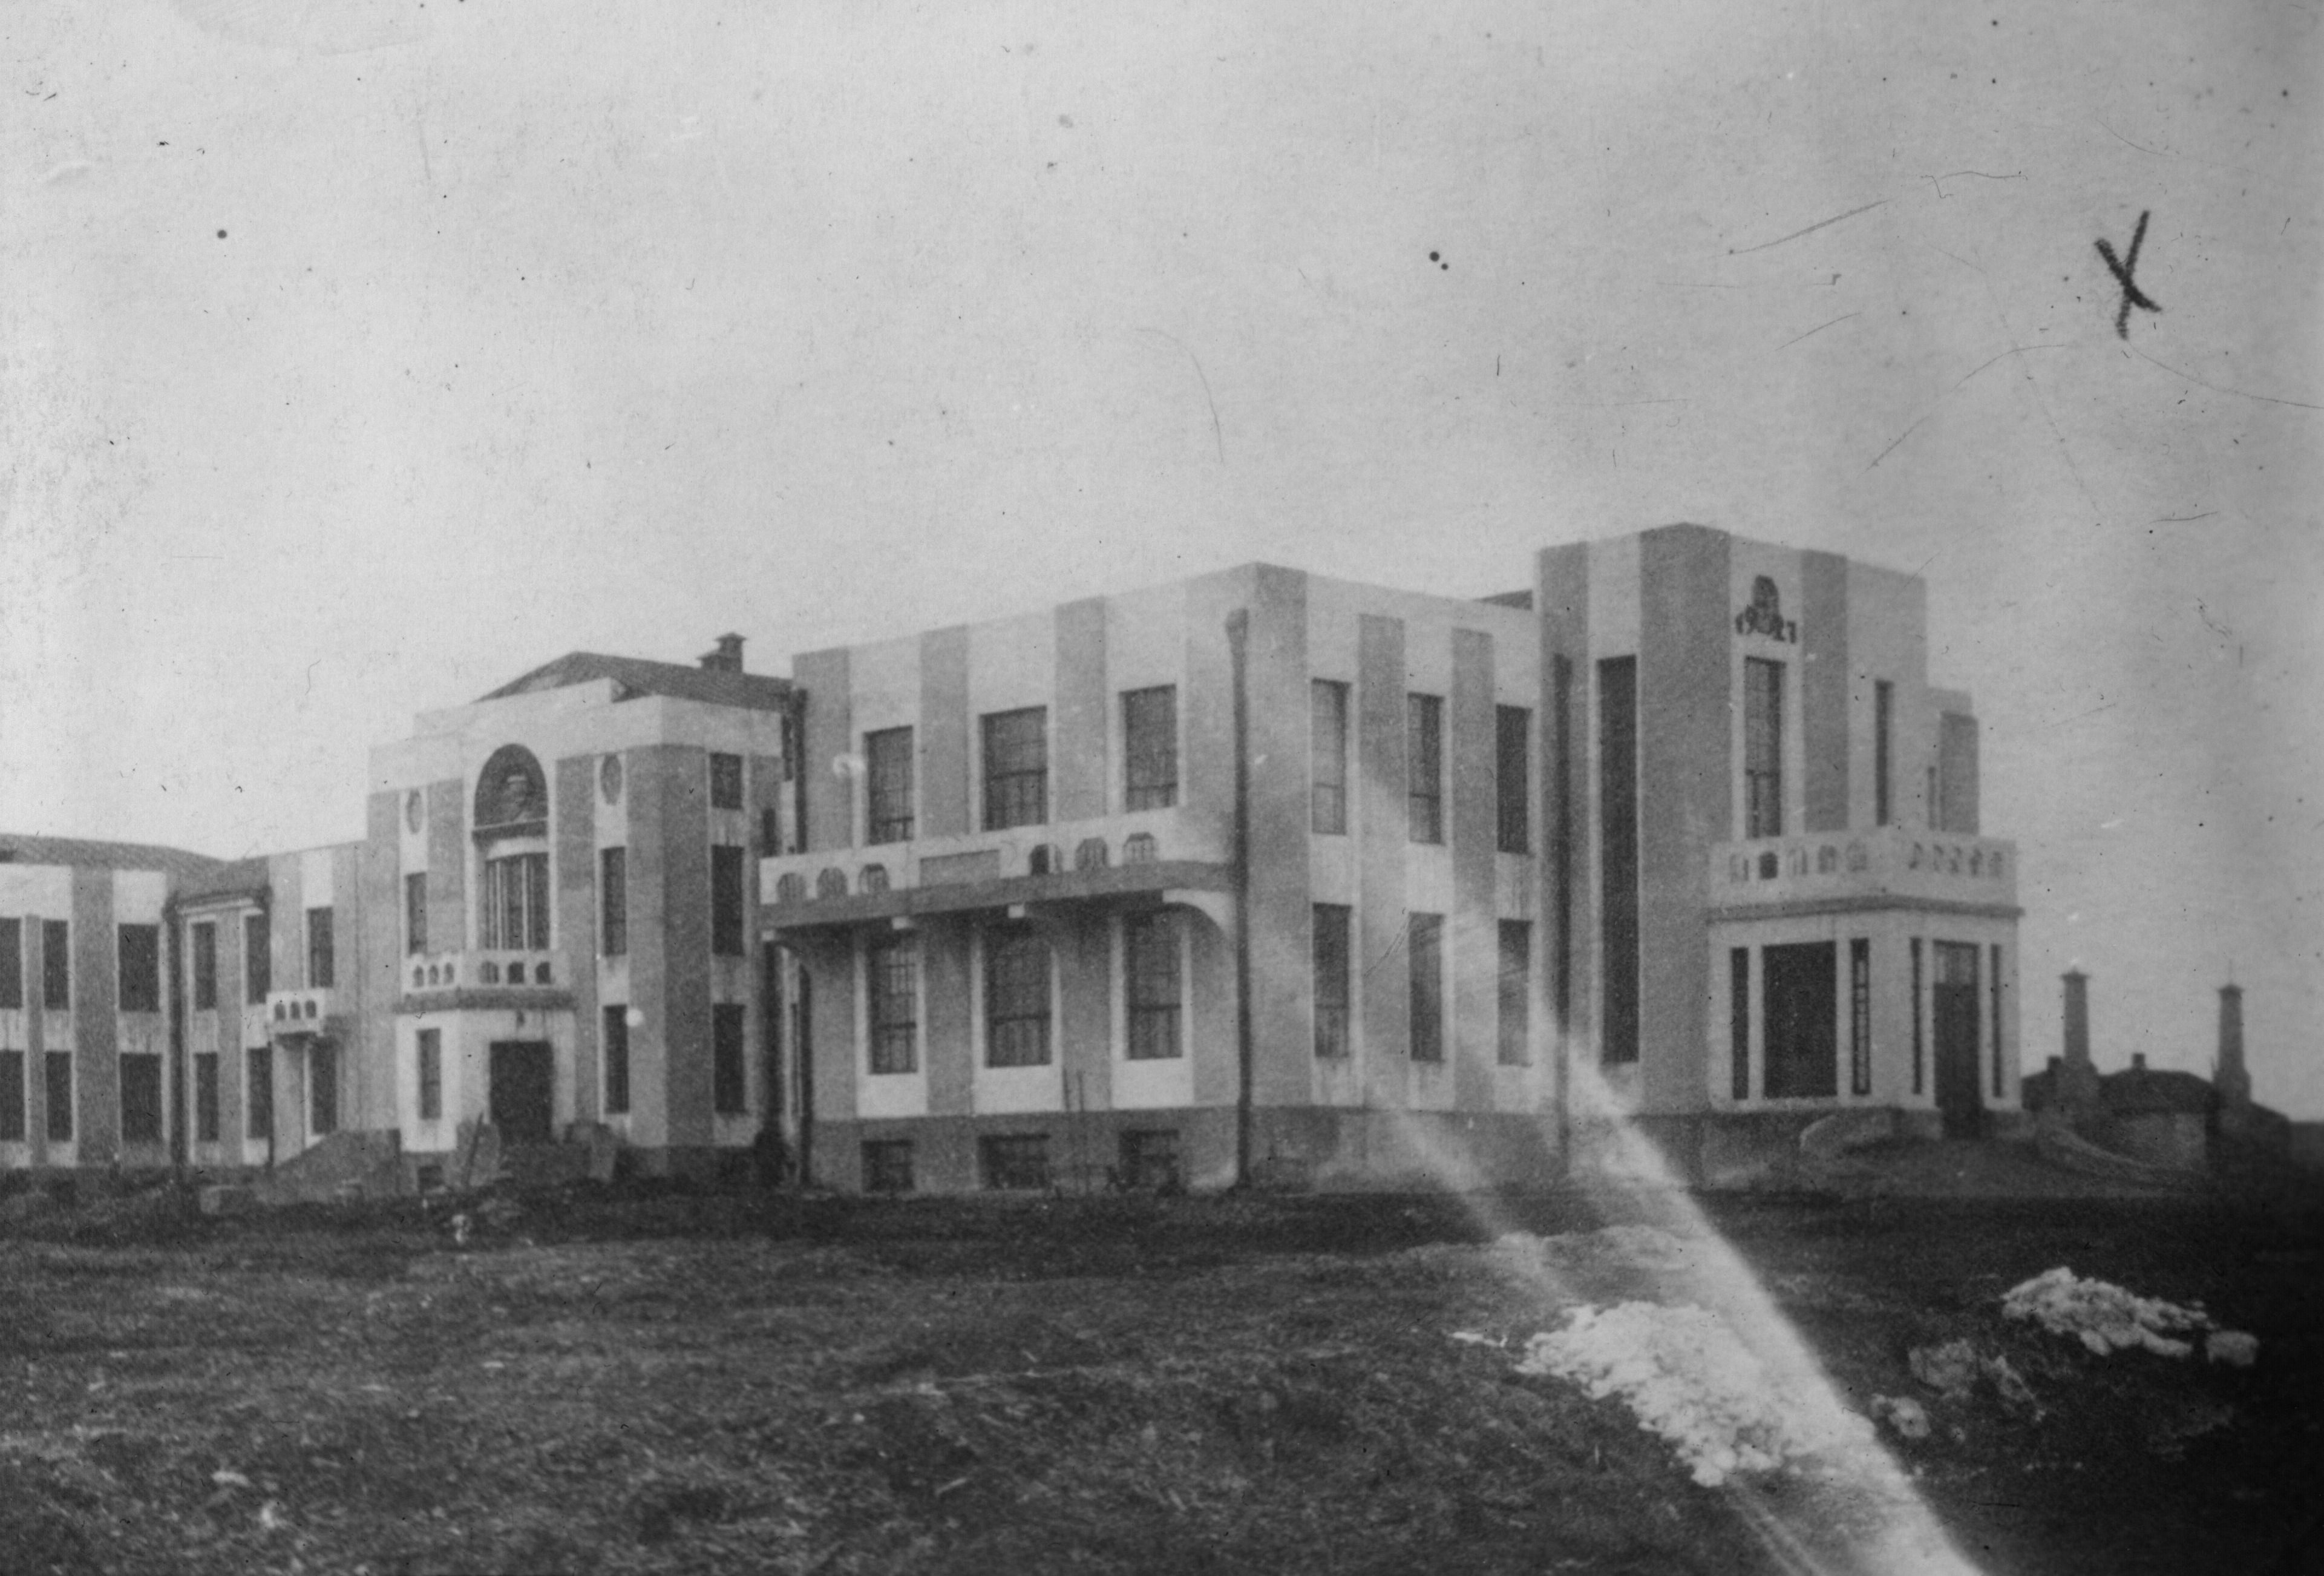 gku-ko-gako_fotofond_op_8d_-d_607_l_1_okruzhnaja-bolnica-v-g_shheglovske_1928.jpg